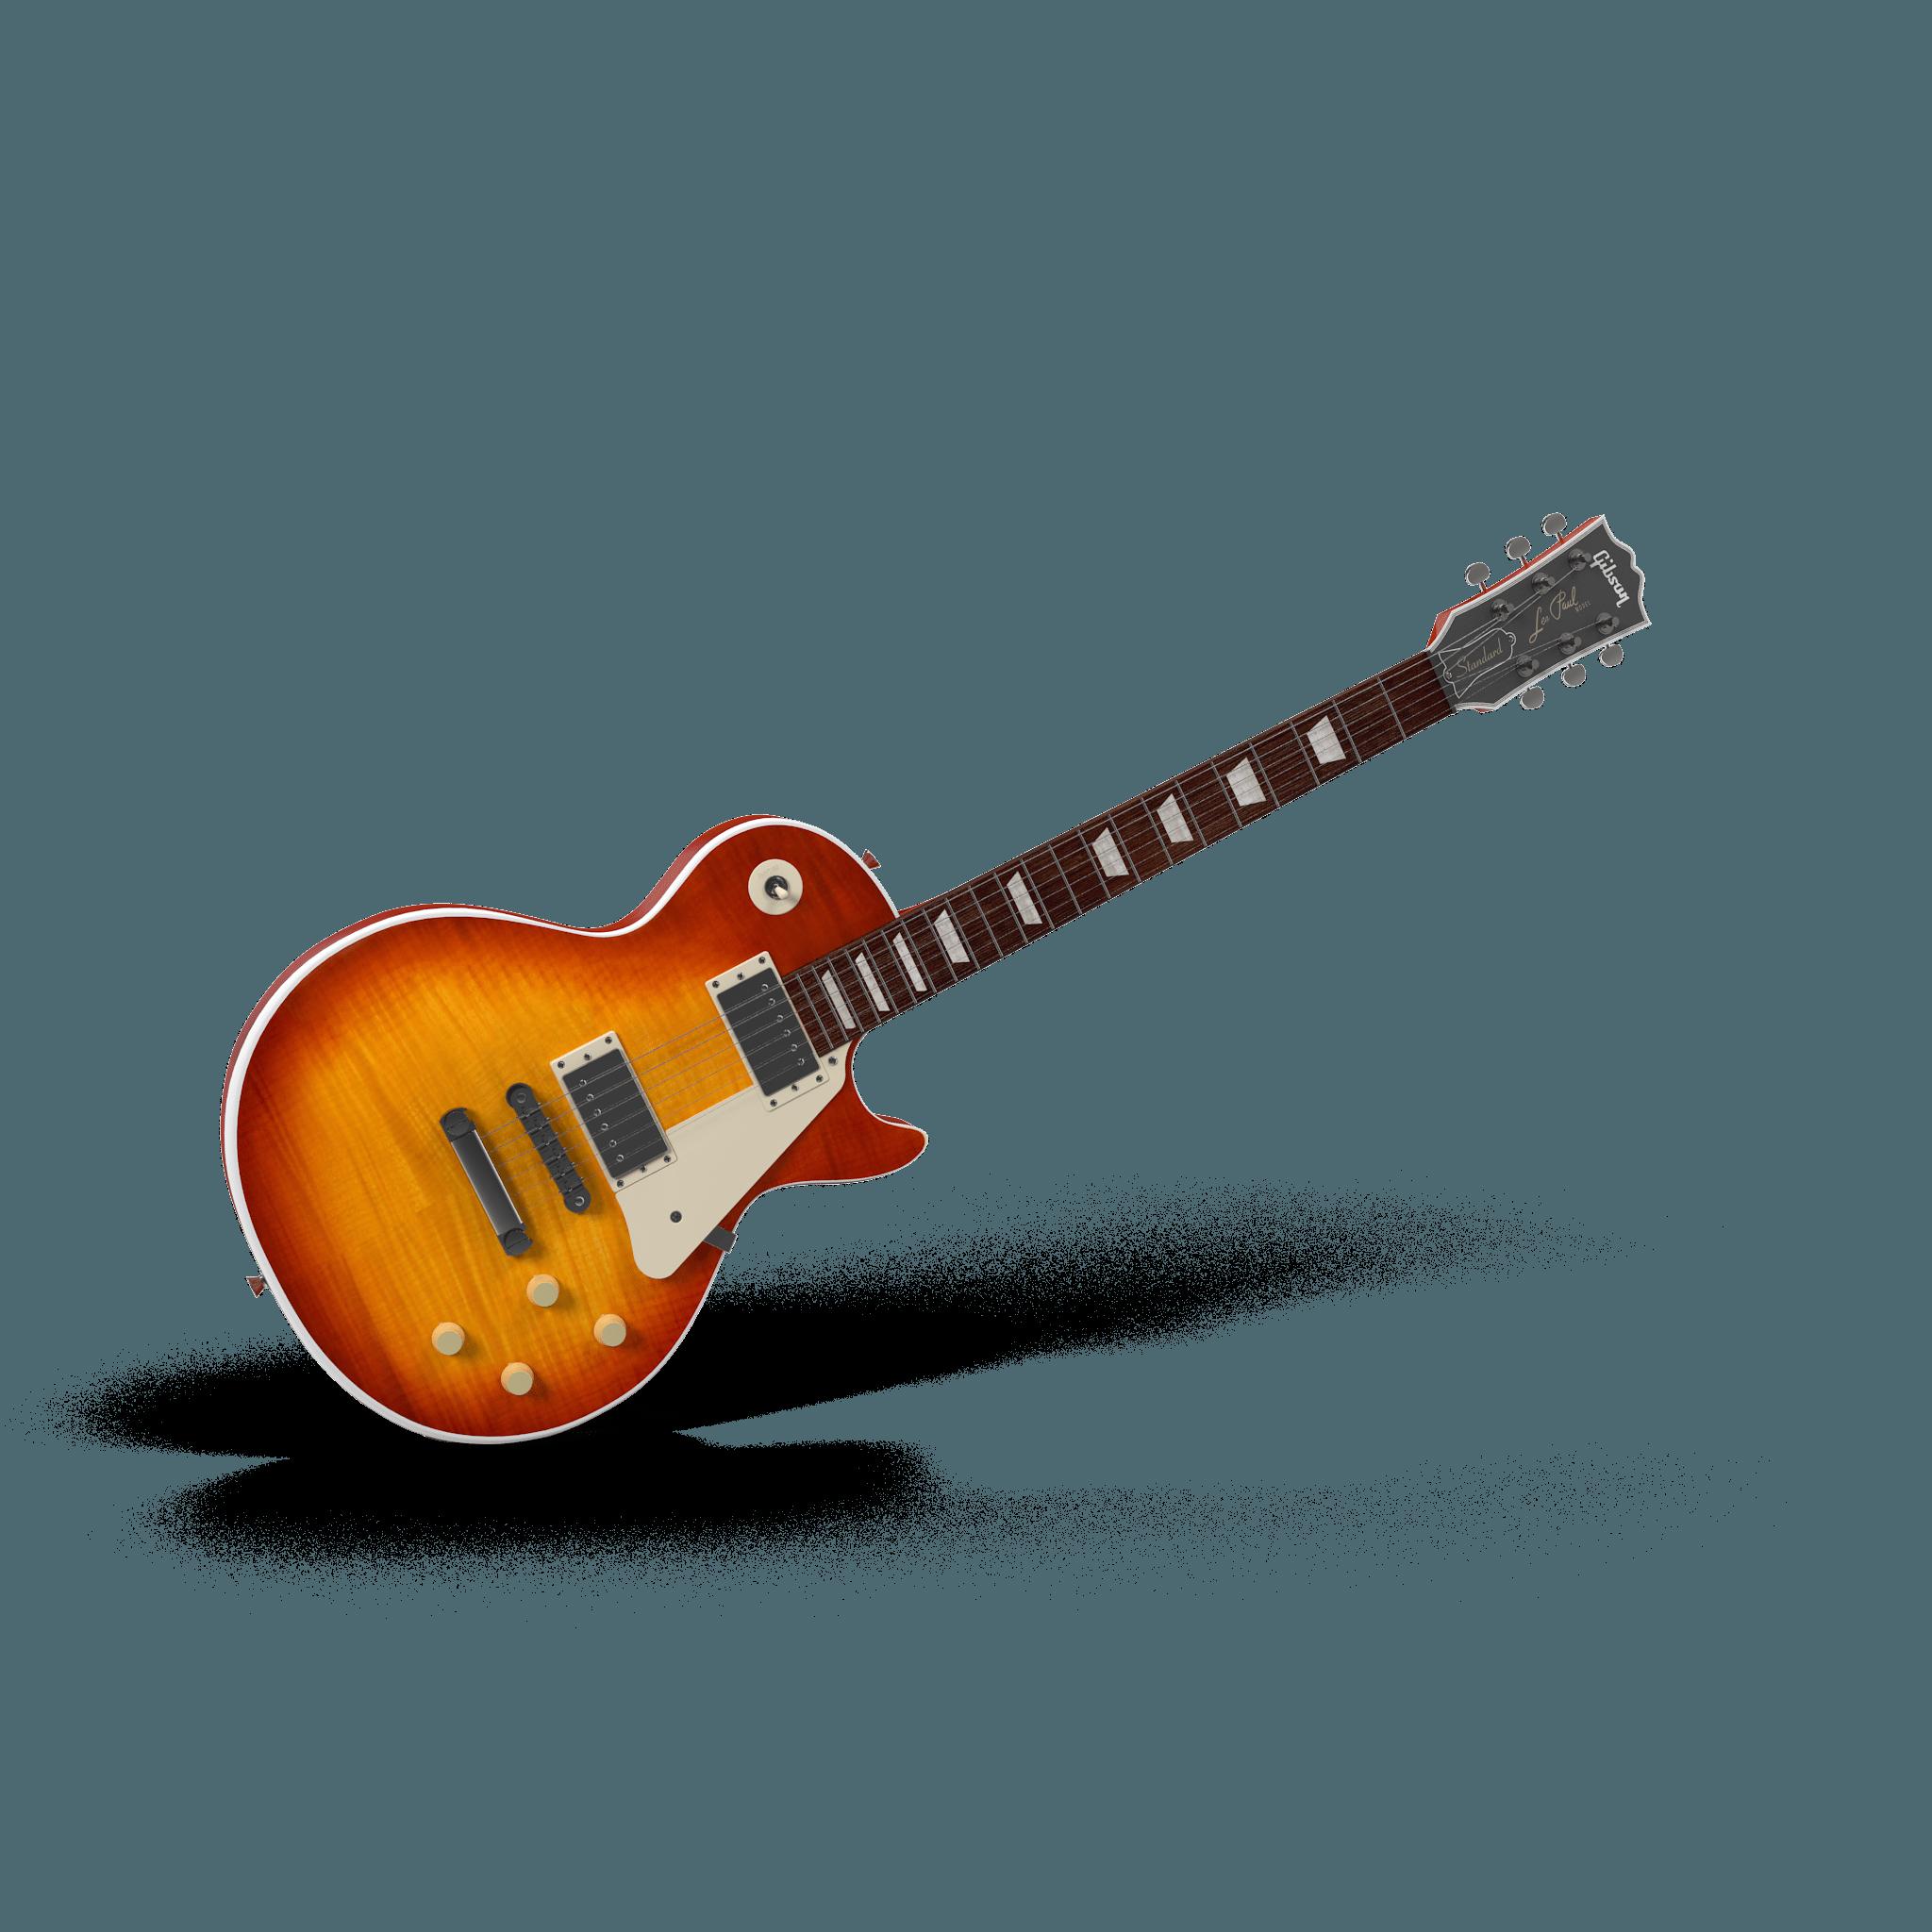 Old-School Beautiful Guitar Mockup 2